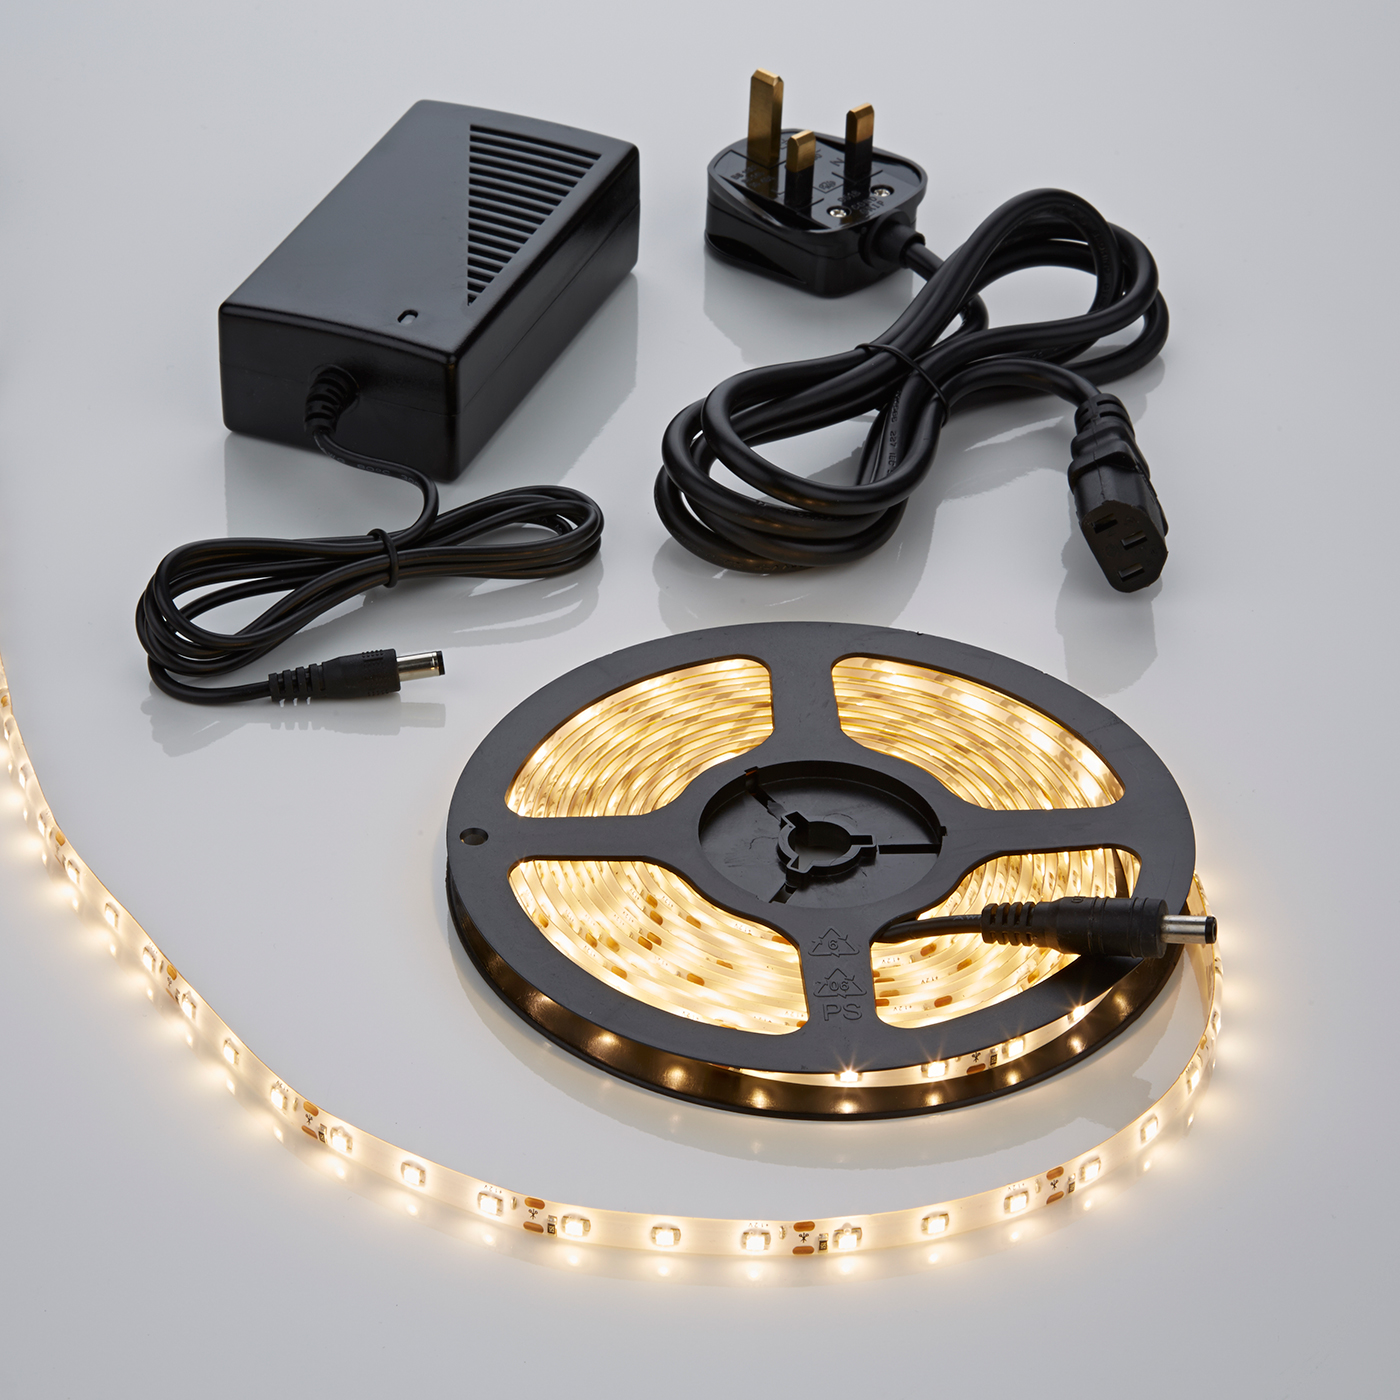 Biard LED IP65 5m 3528 Plug & Play Strip Light Kit - Warm White